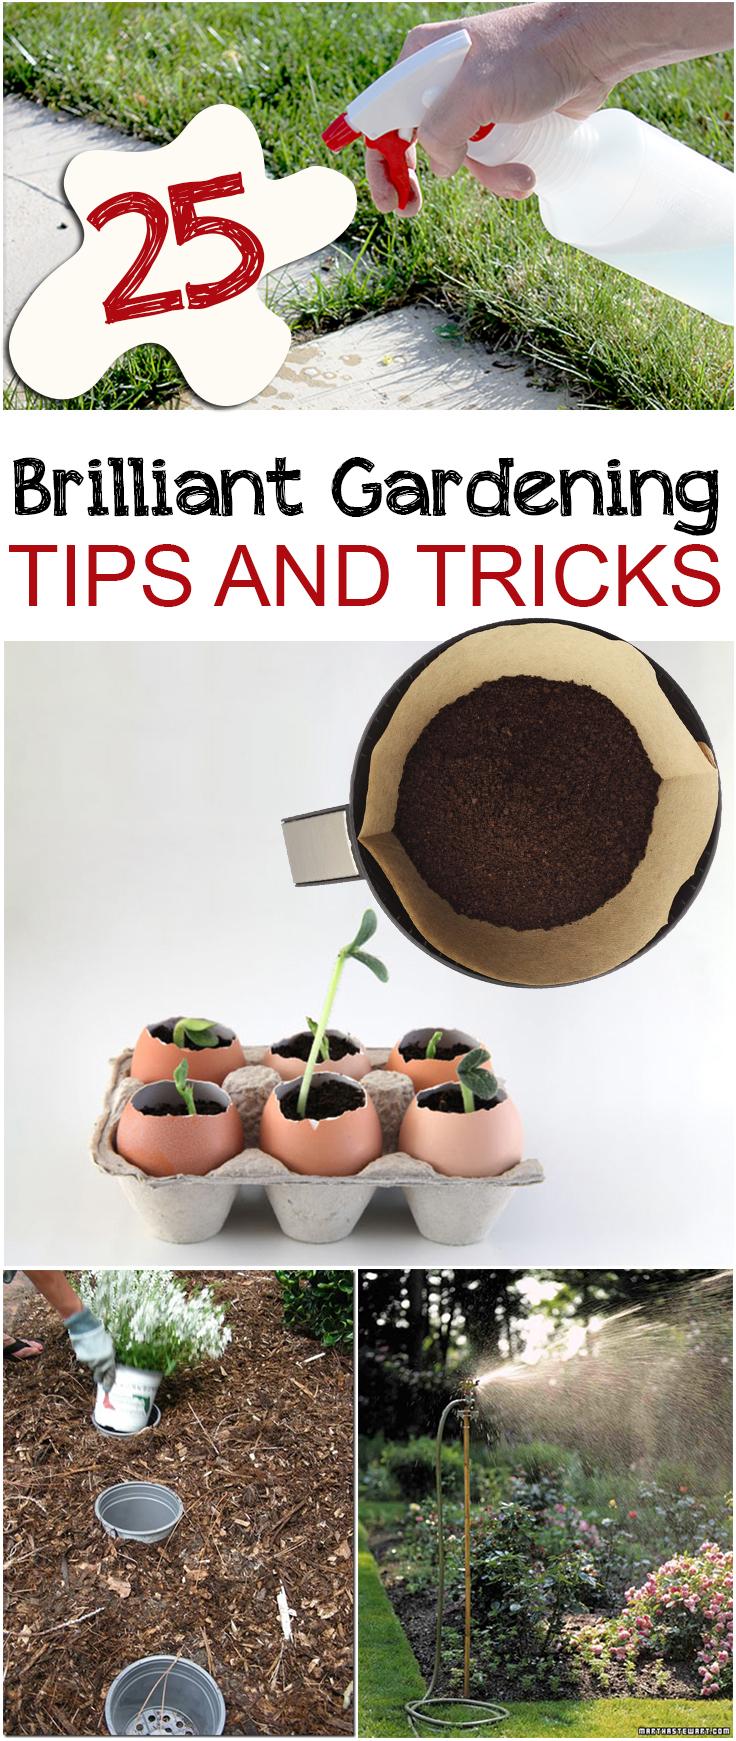 25 BriGardening, gardening hacks, gardening tips, easy gardening tips, popular pin, outdoor living, indoor gardening, easy gardening, organic gardening.lliant Gardening Tips and Tricks